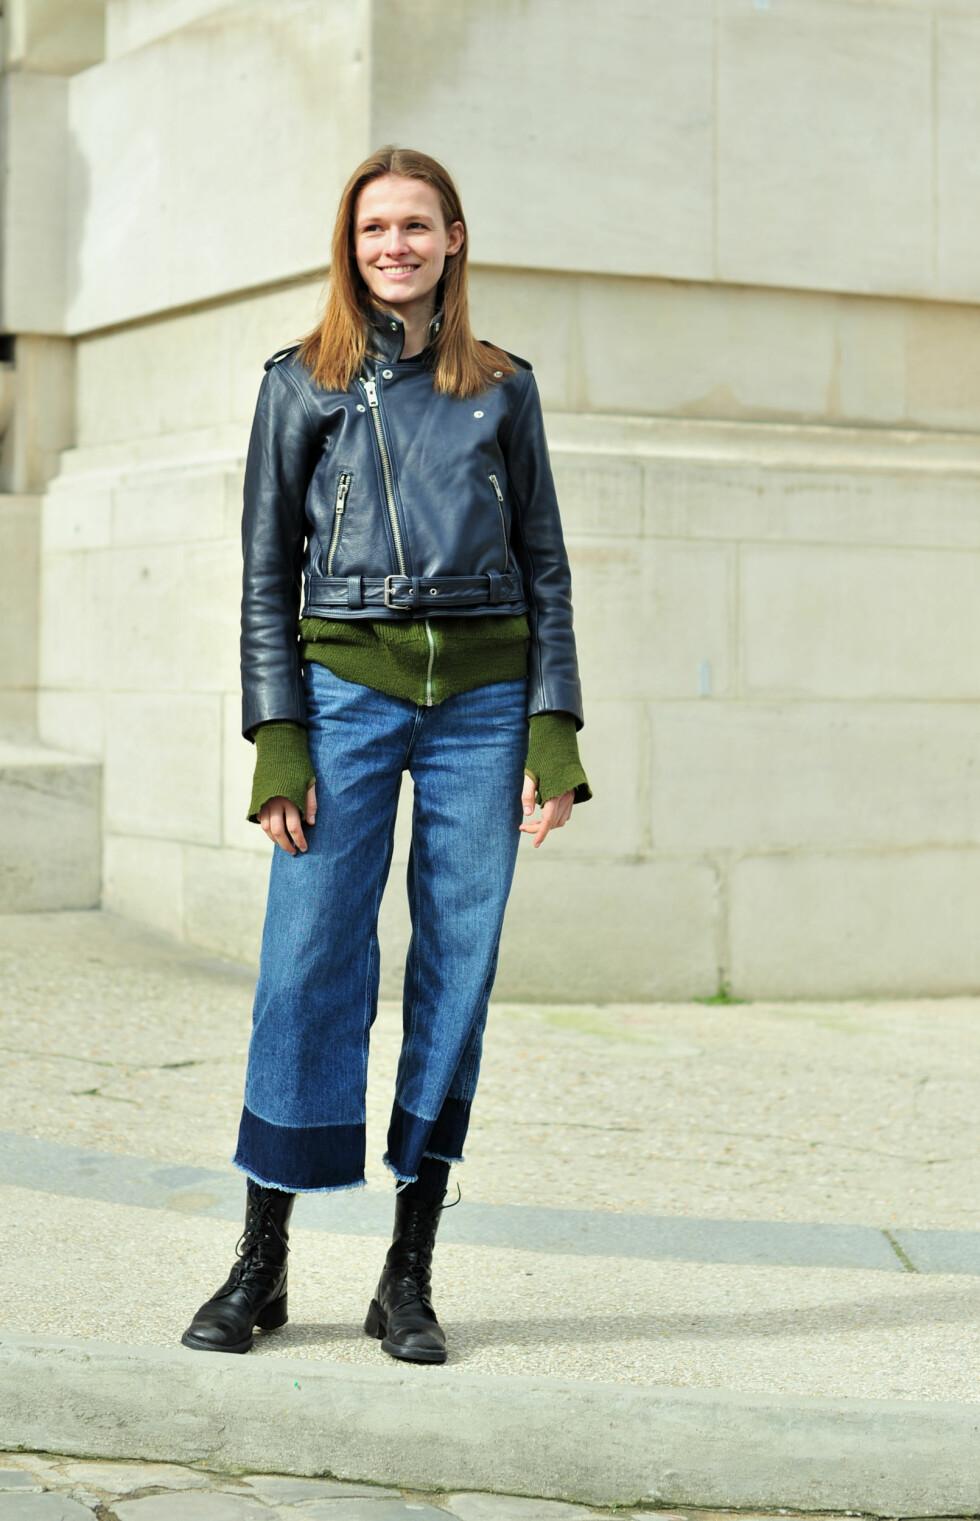 Modellen Emma Oak brukte culottene da hun løp mellom motevisningene i Paris.  Foto: Scanpix